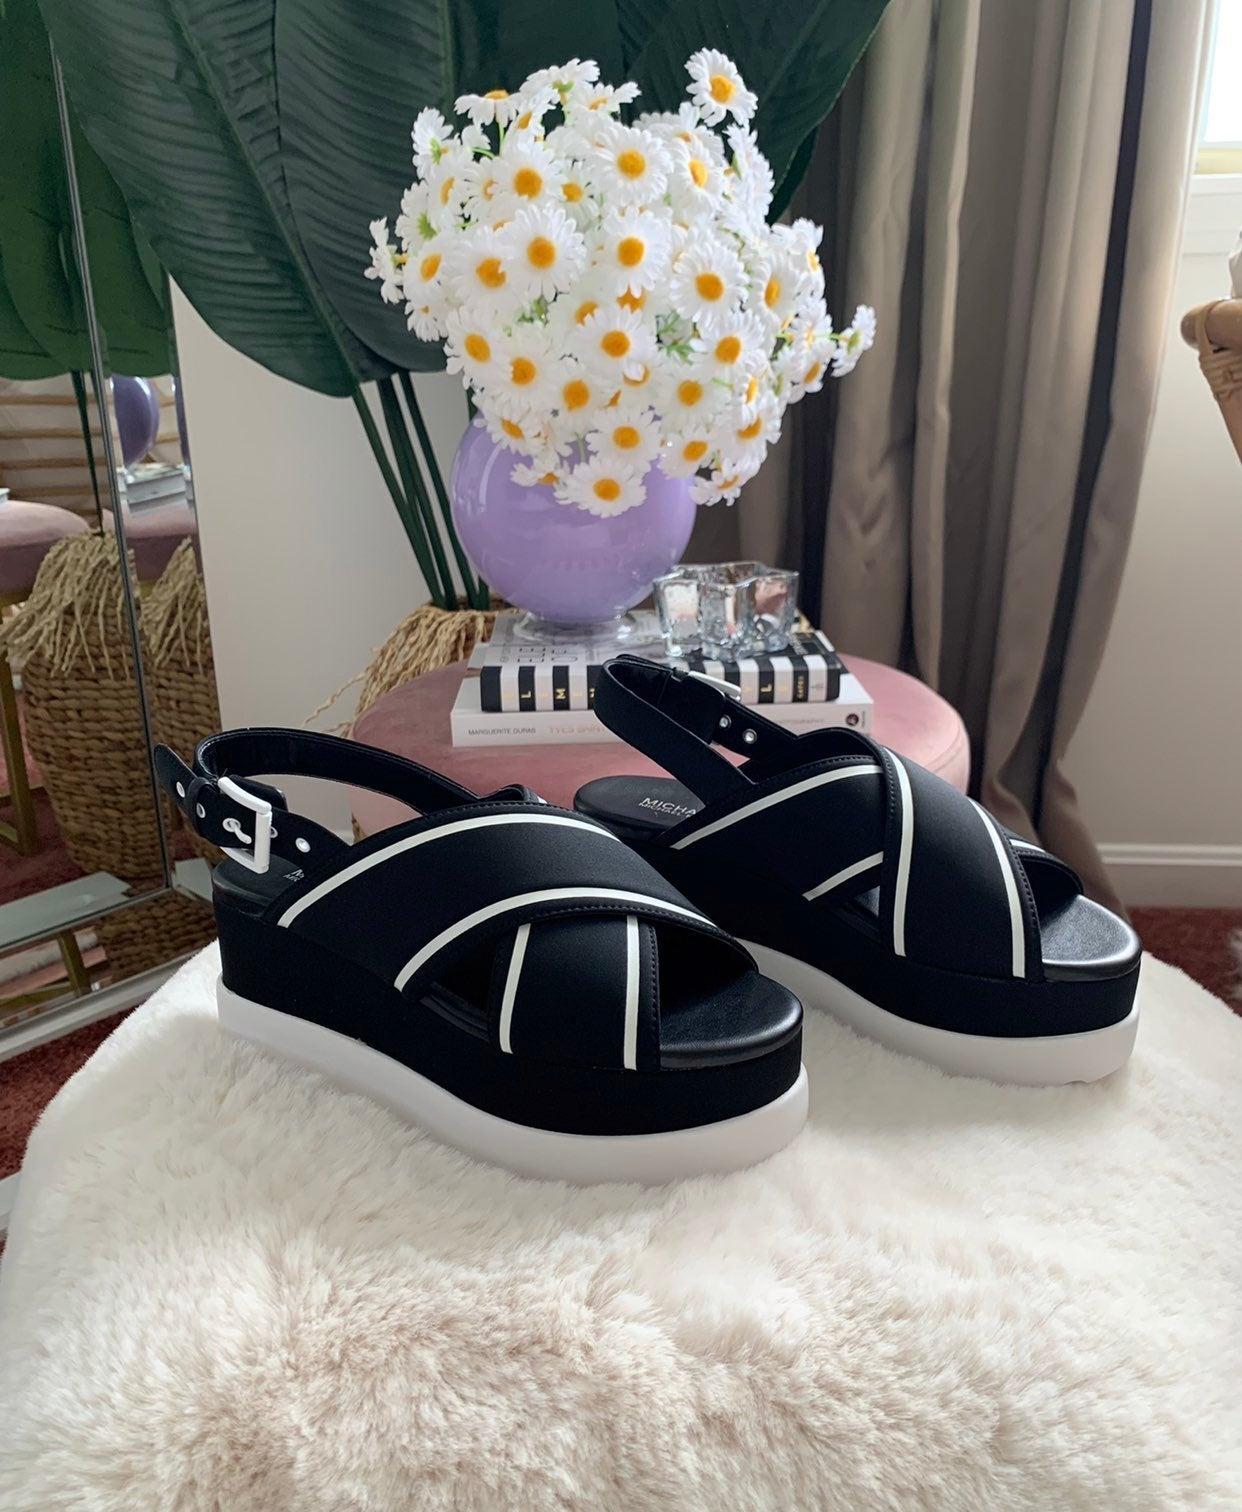 Michael Kors Becker Scuba Sandal US 5.5